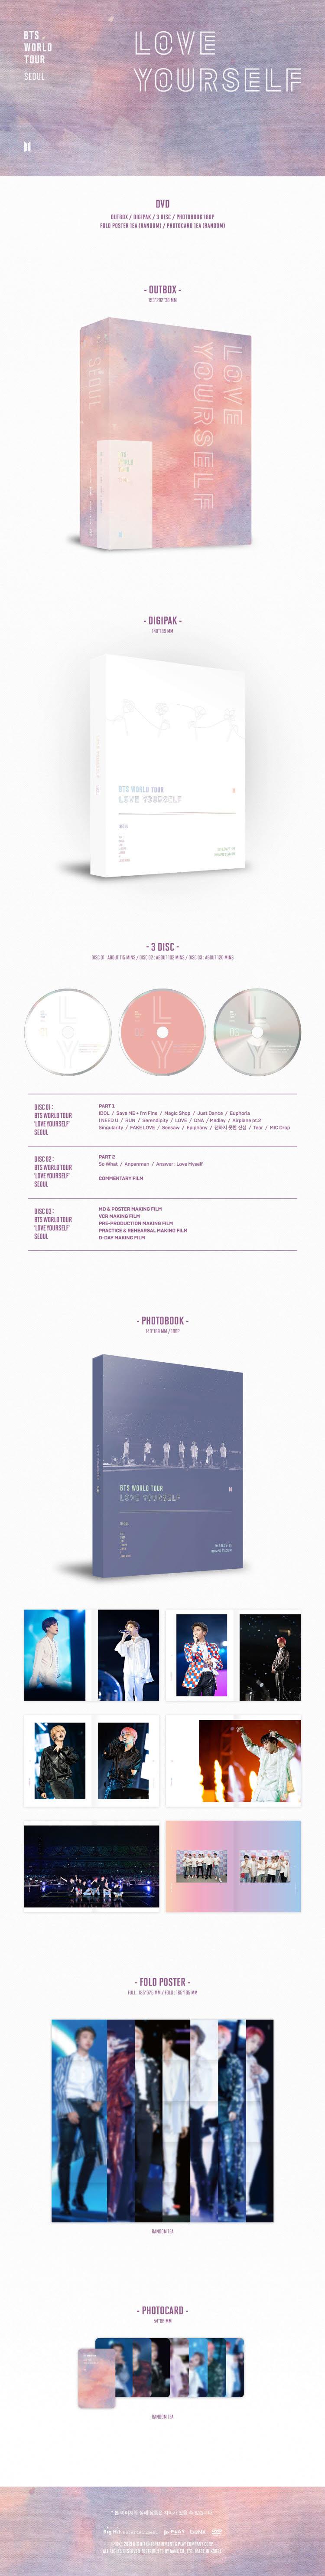 BTS - BTS WORLD TOUR 'LOVE YOURSELF' SEOUL (DVD)